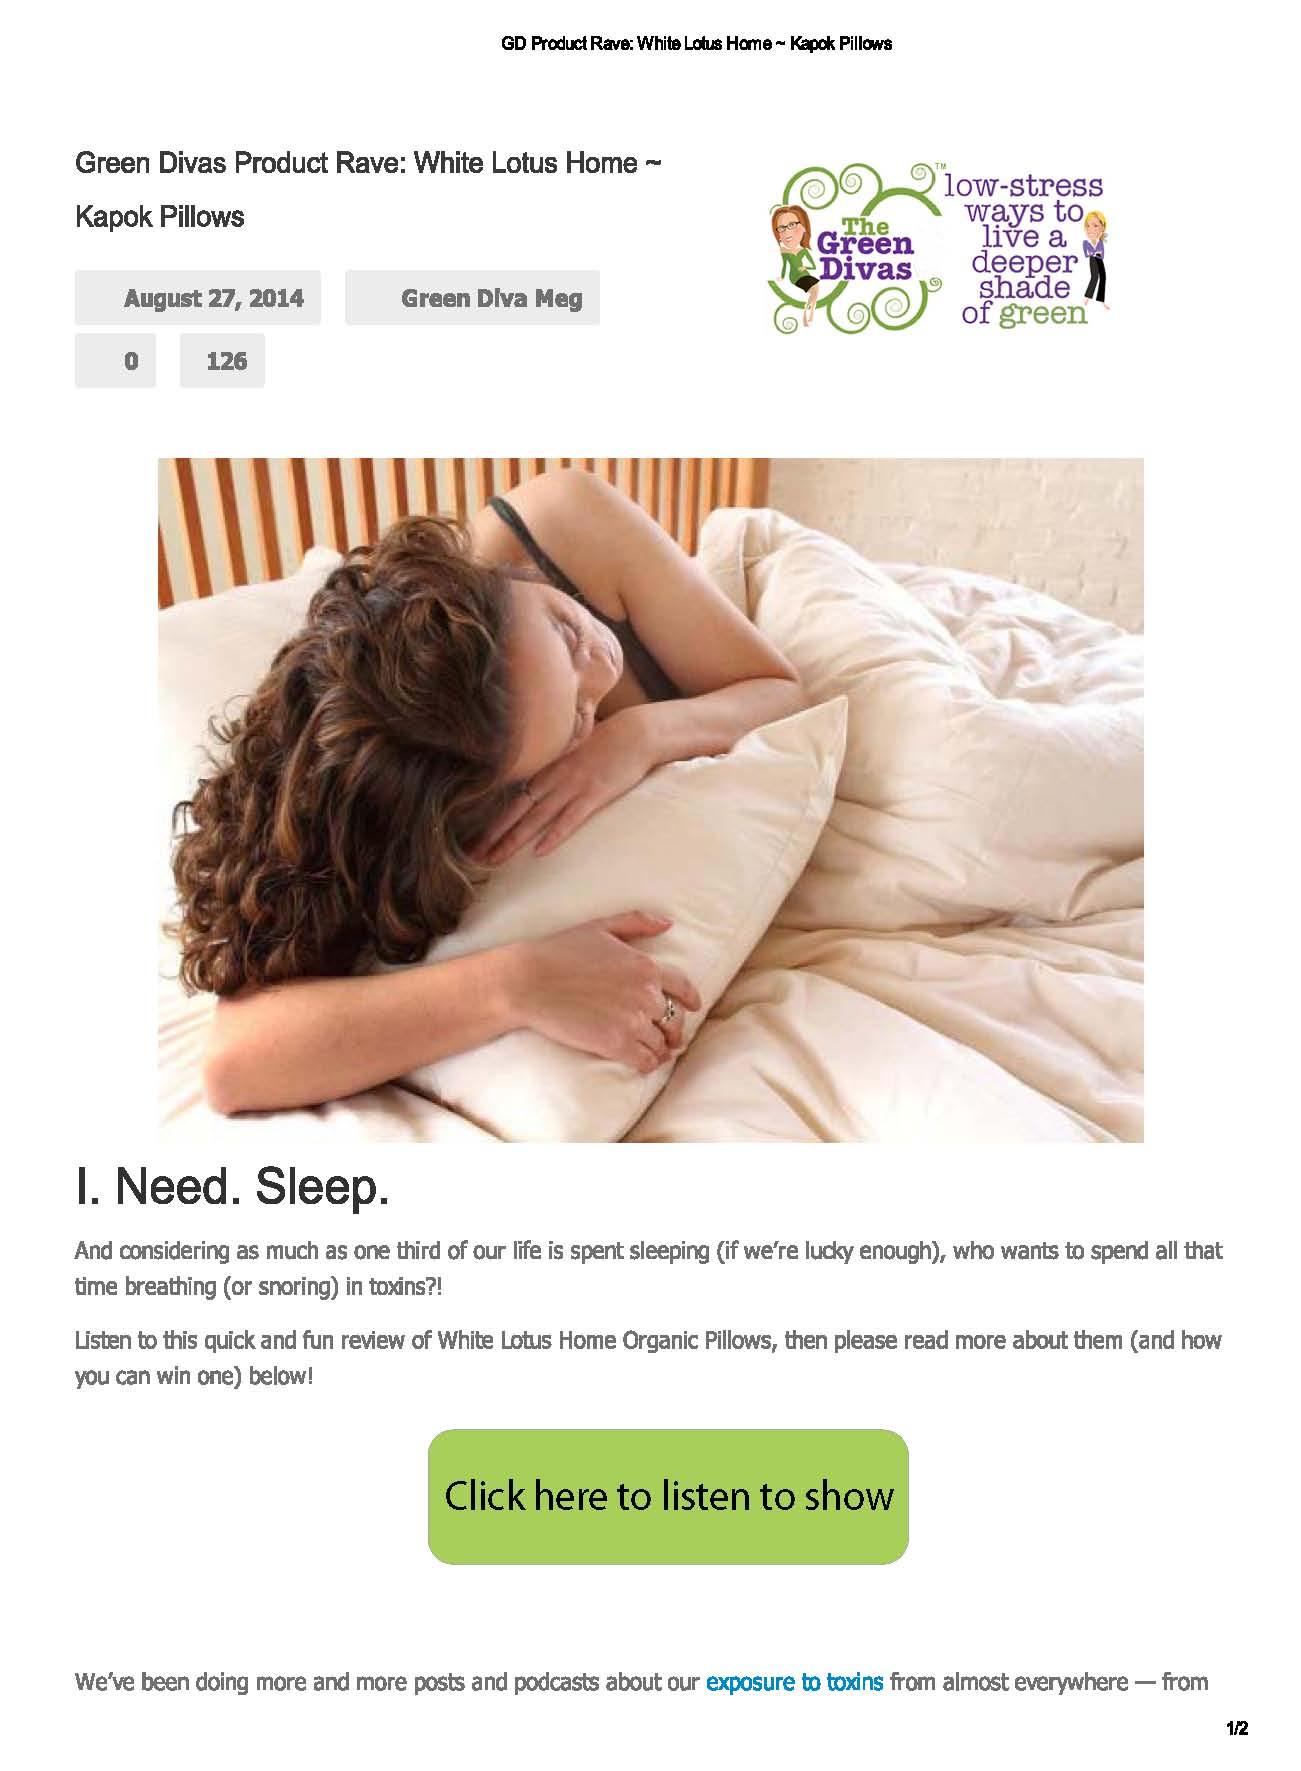 Green Divas Product Review Kapok Pillows August 27, 2014